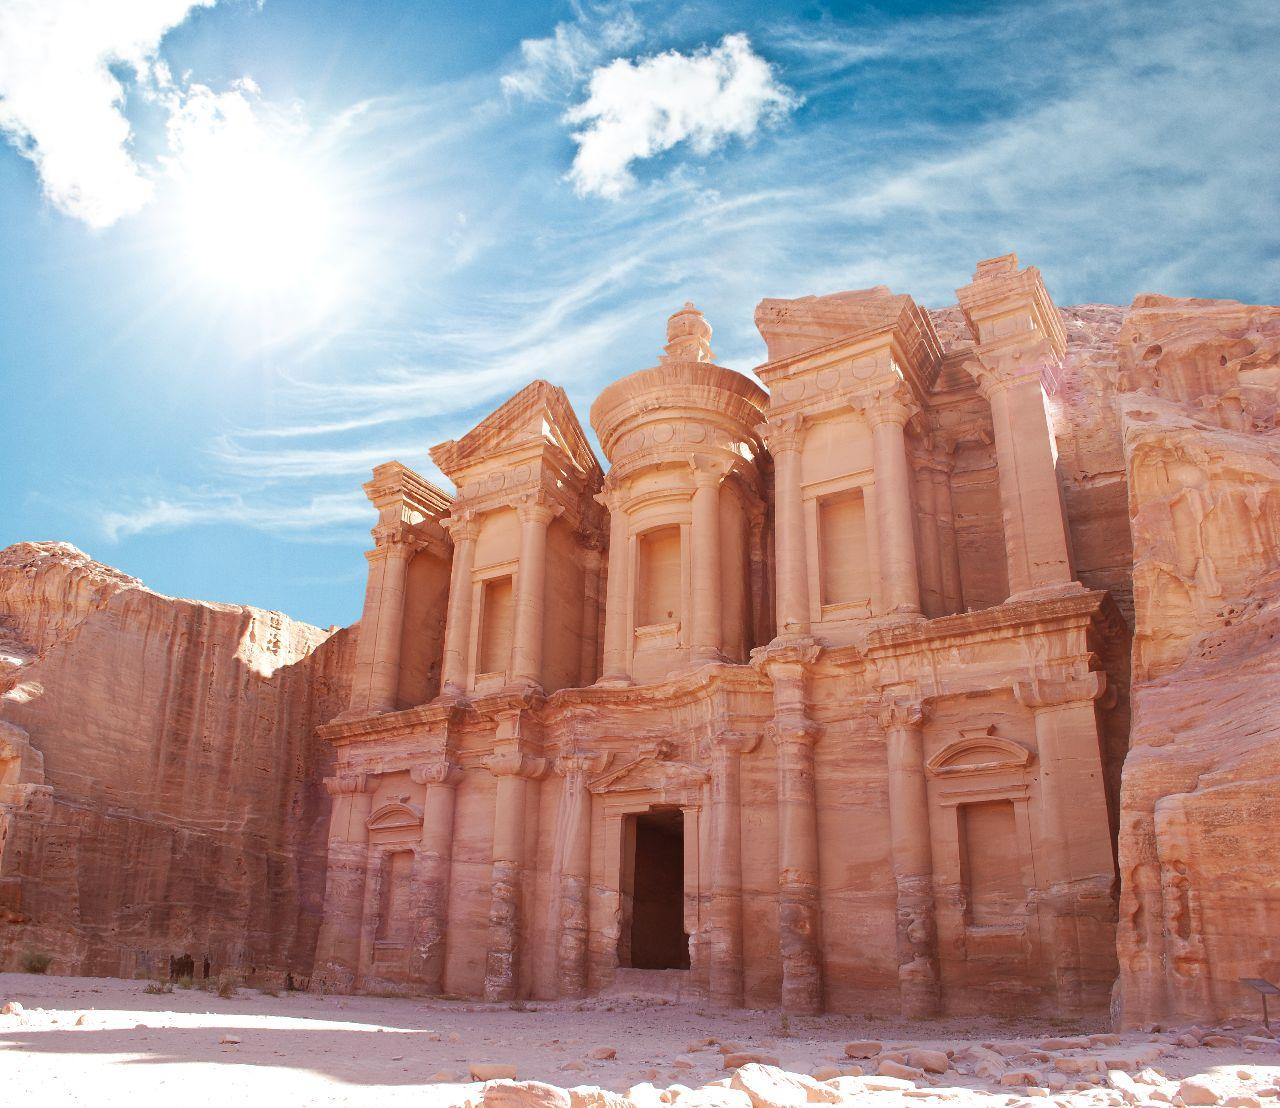 petra v jordansku